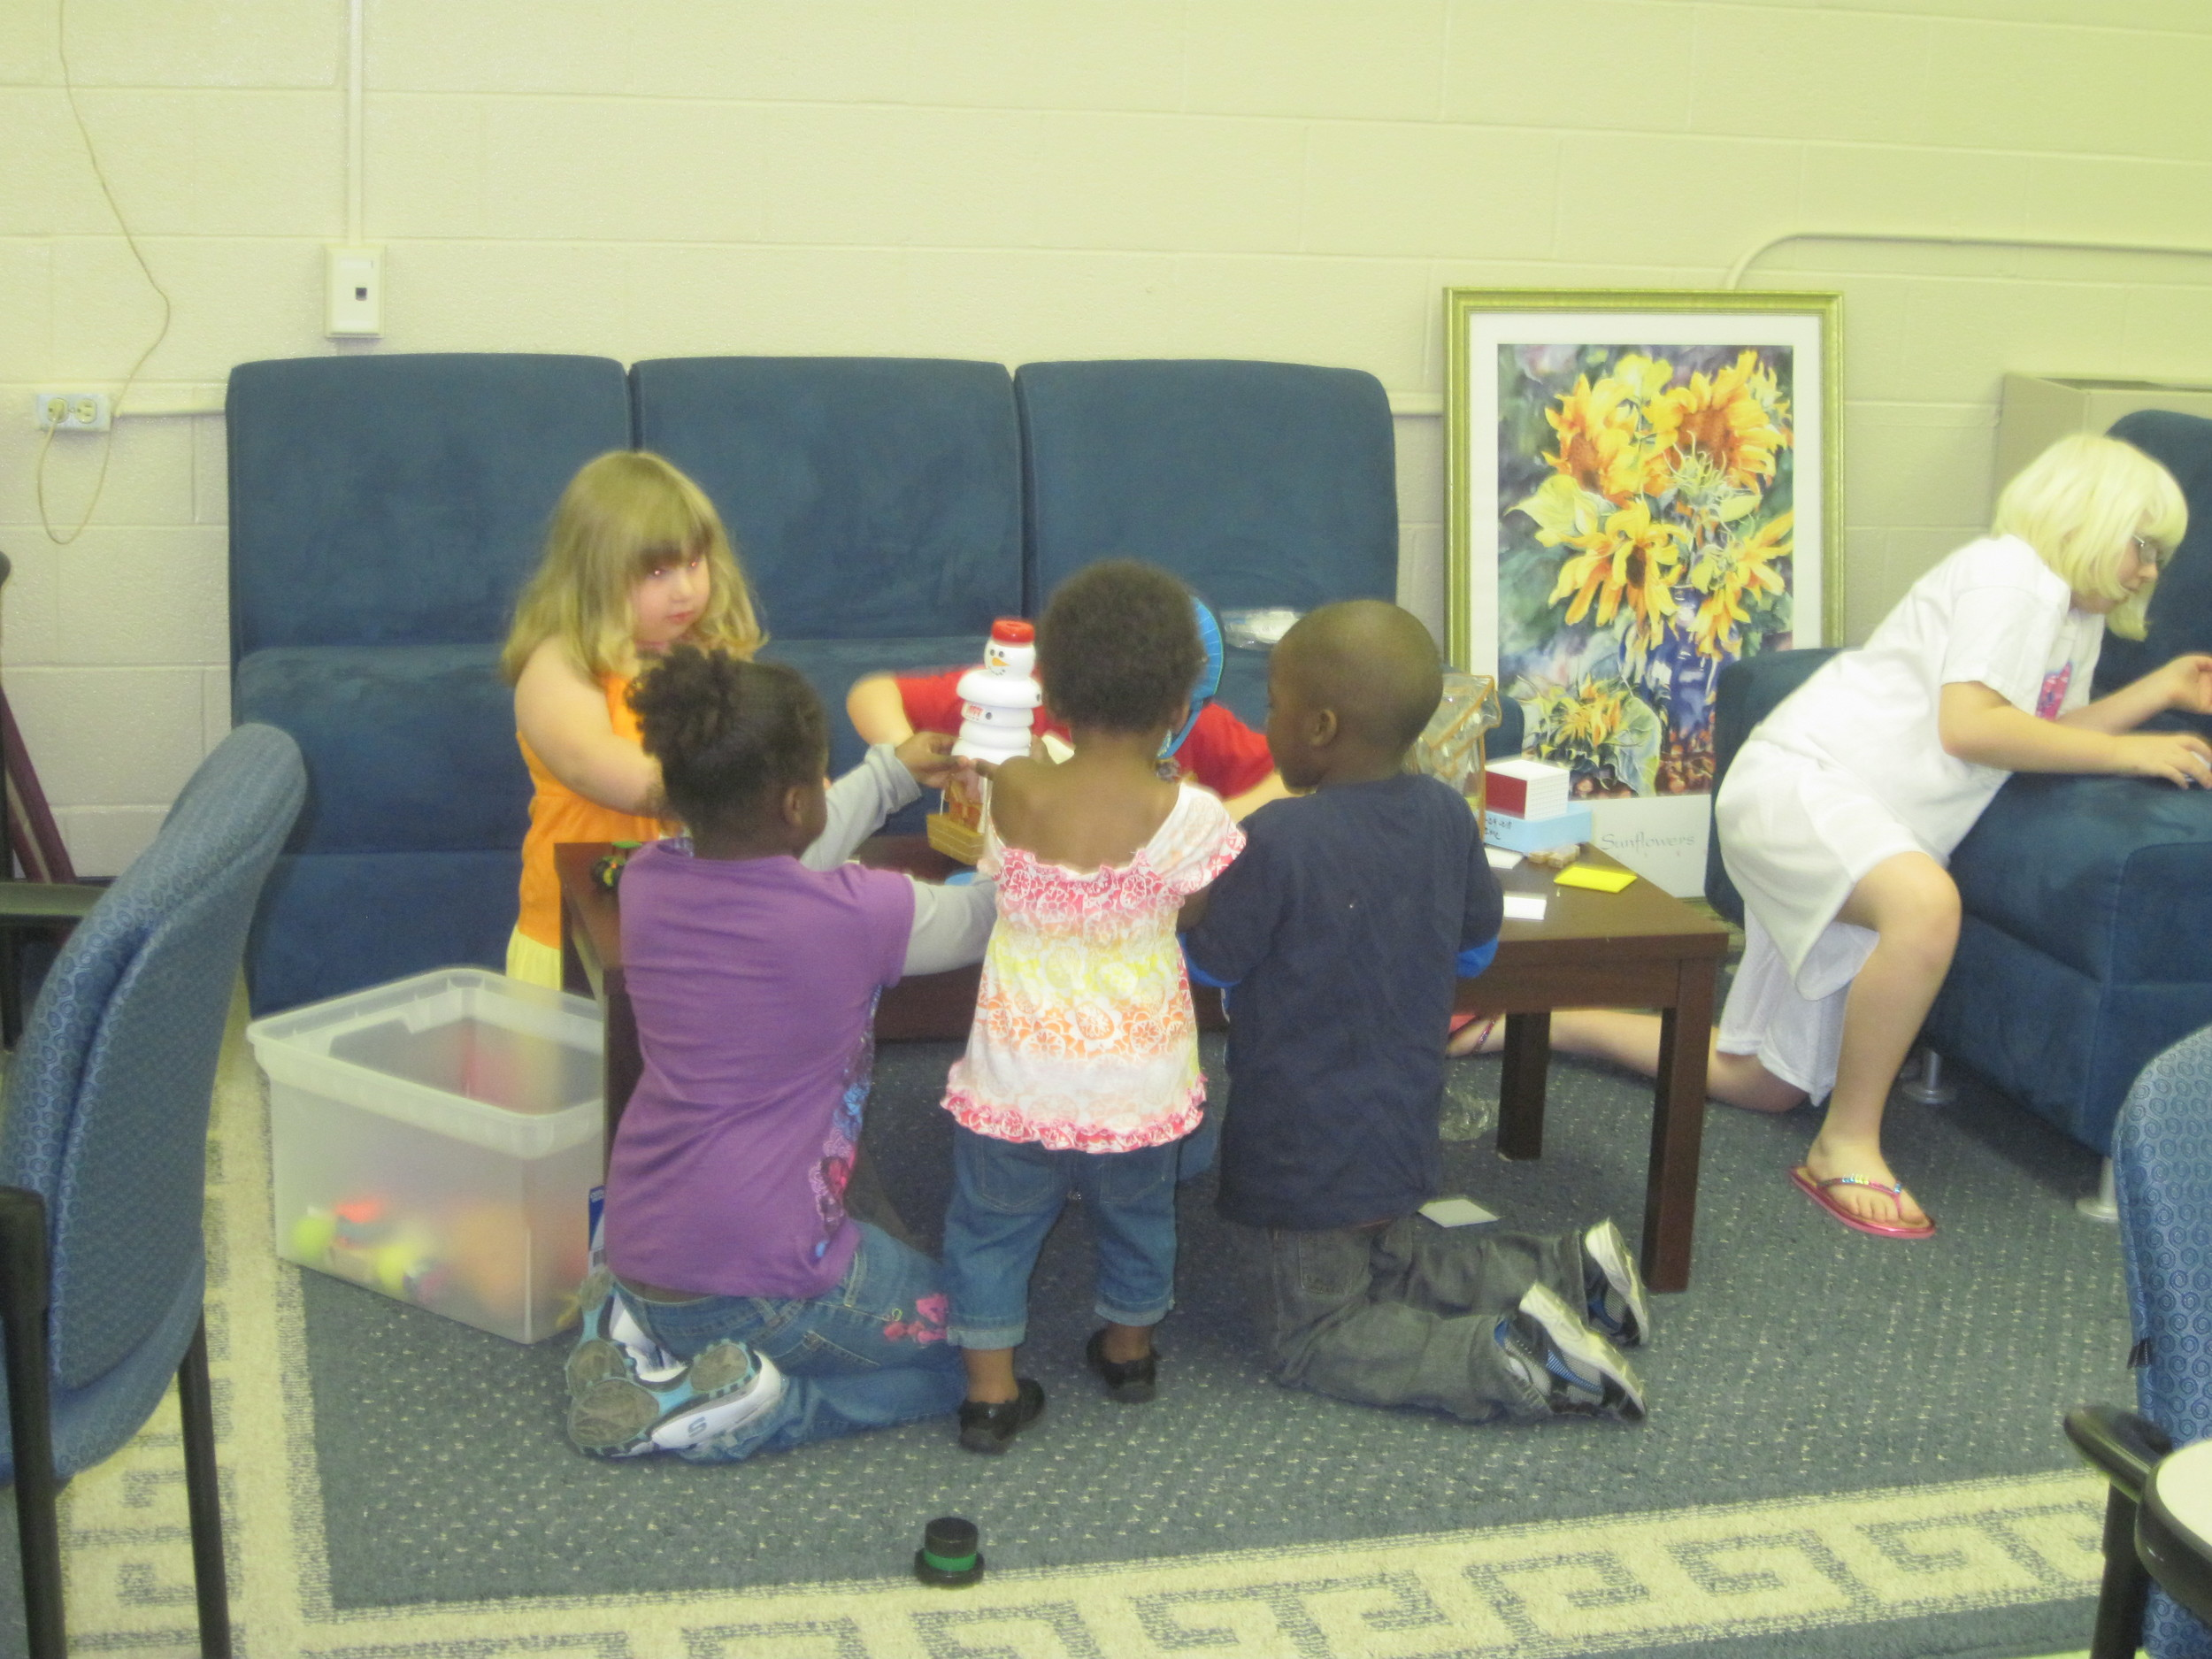 Book and play center fun